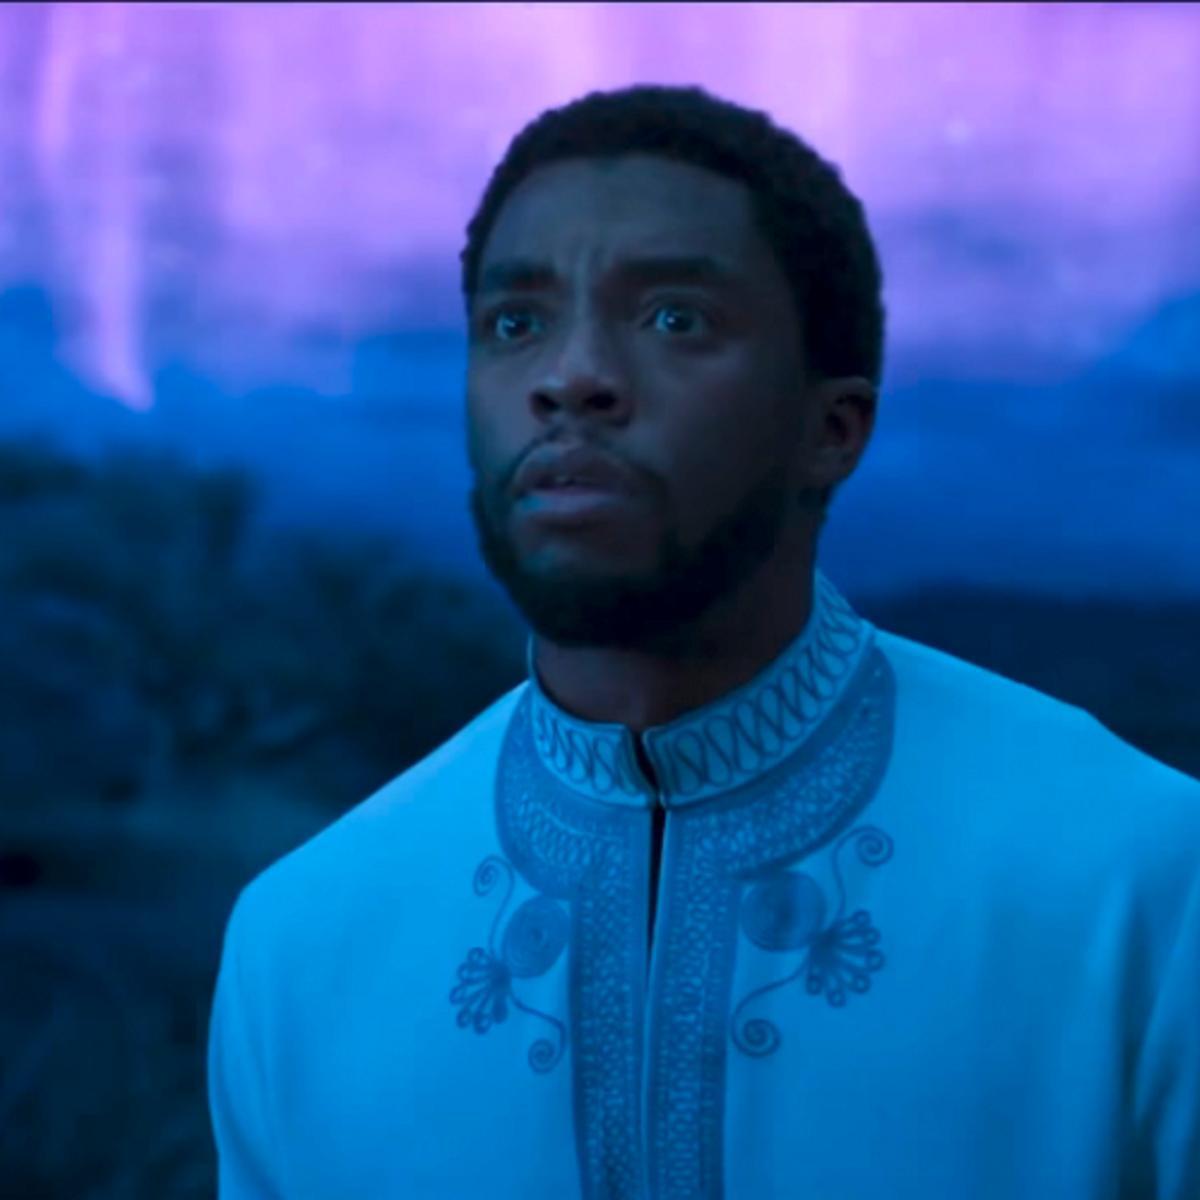 Black Panther spirituality exposure